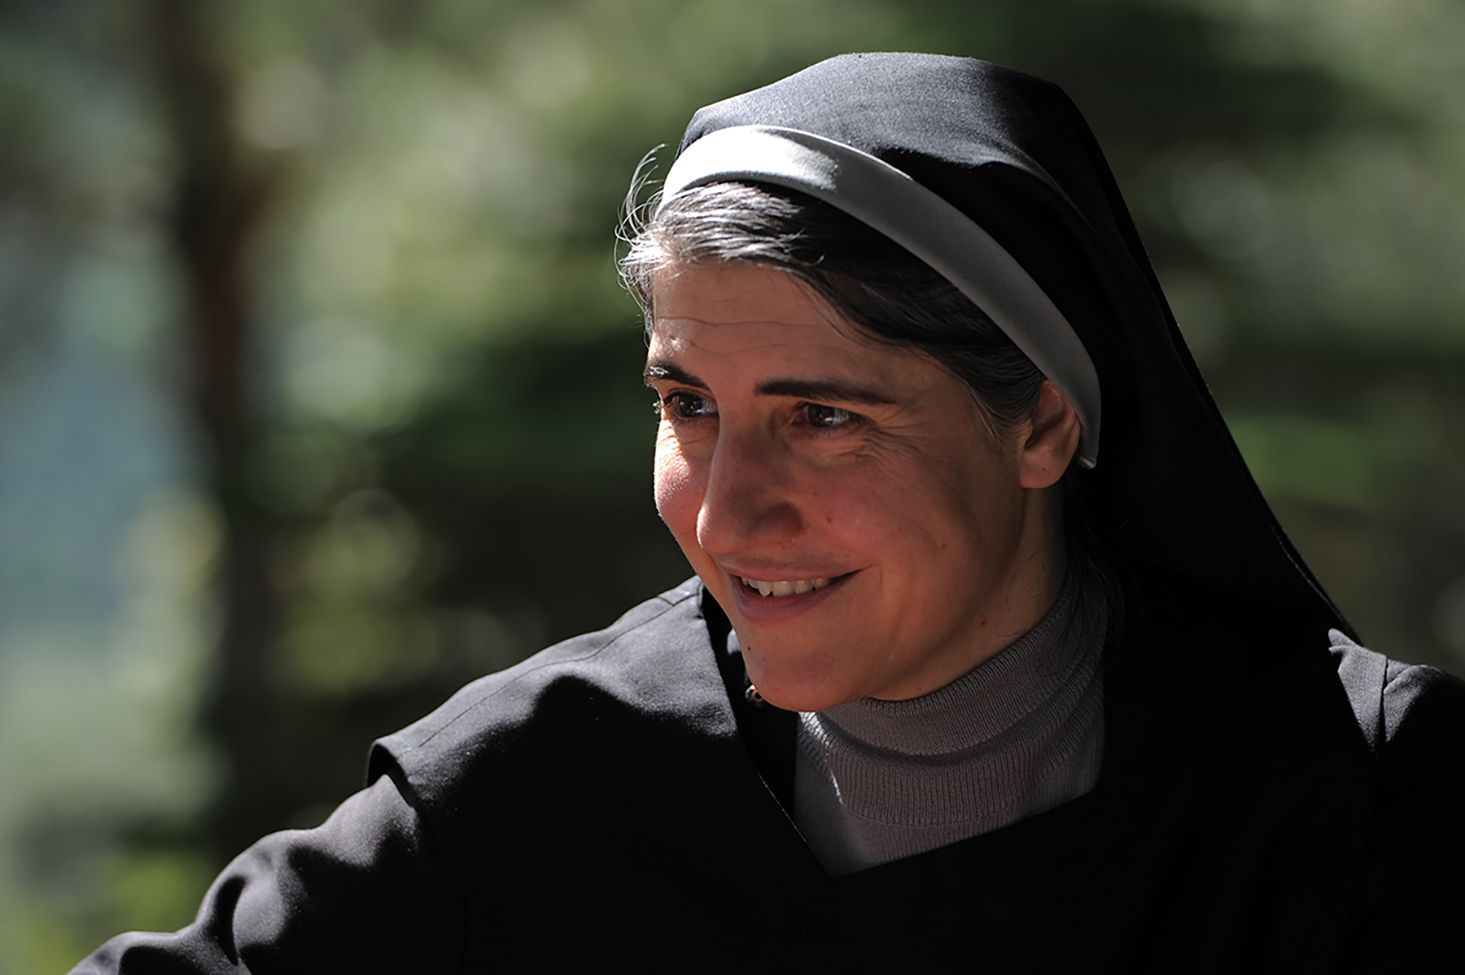 The Benedictine Nun Physician And Feminist Theologian